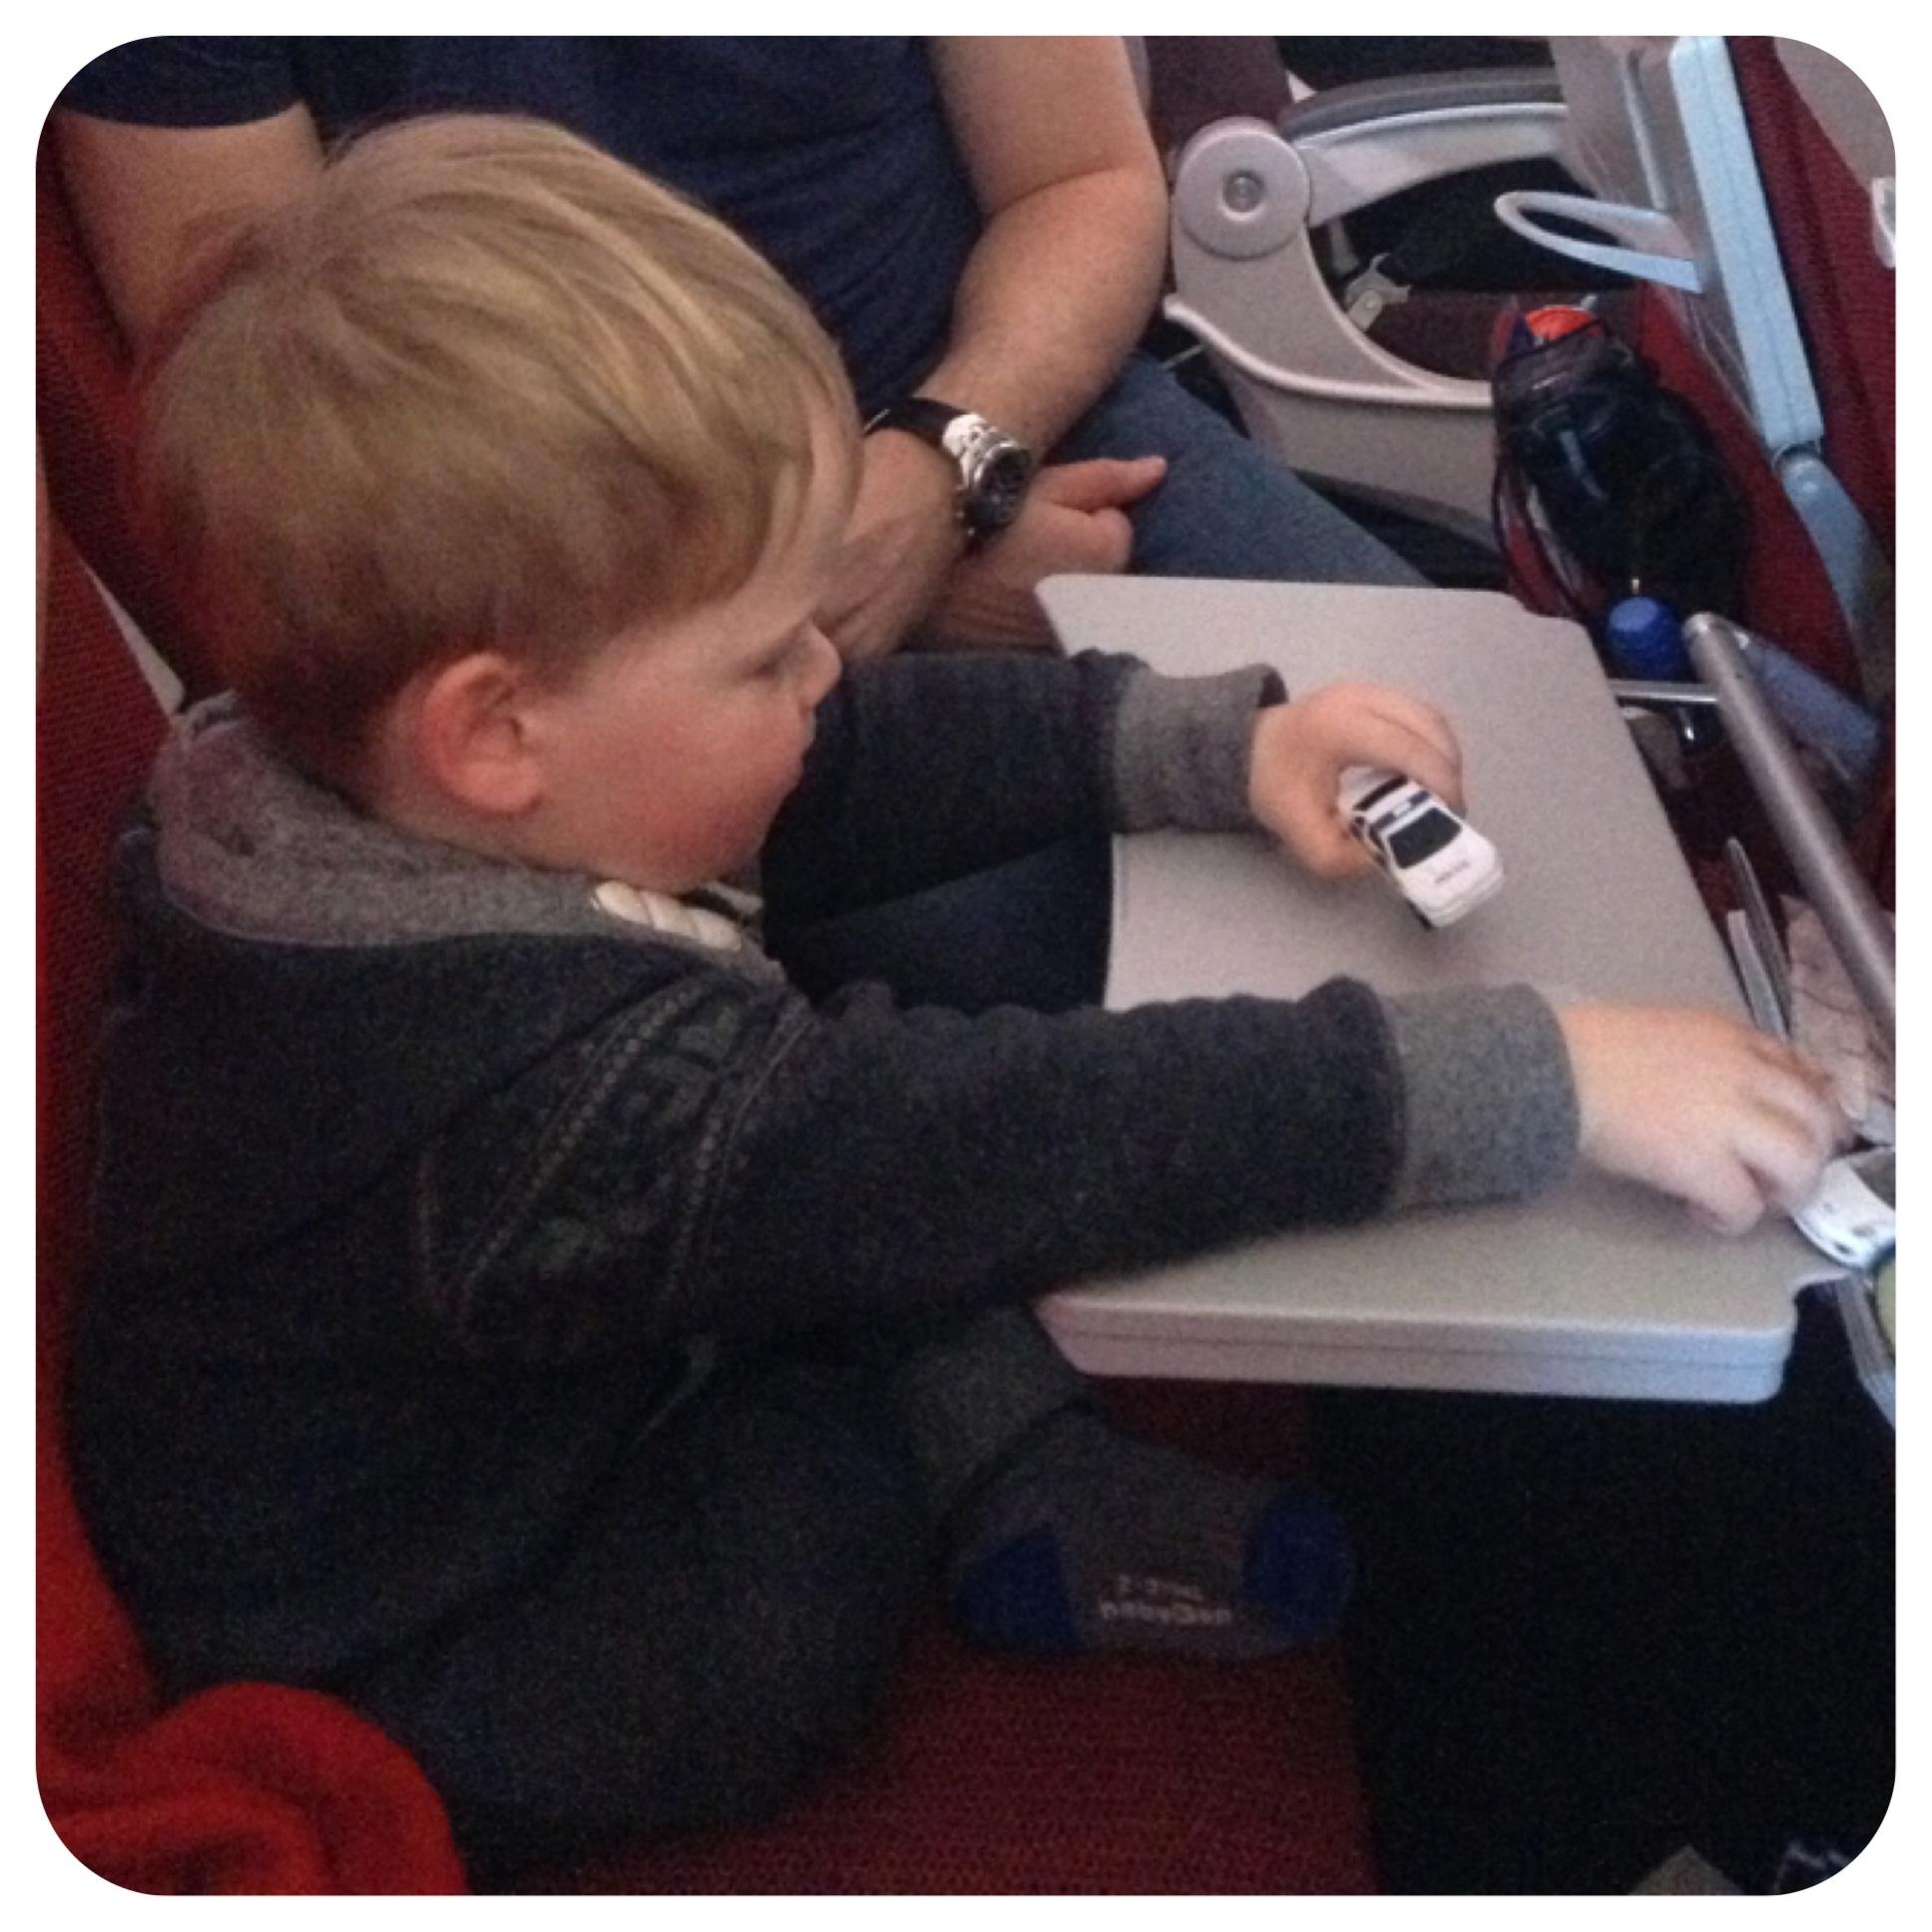 Fun on the flight